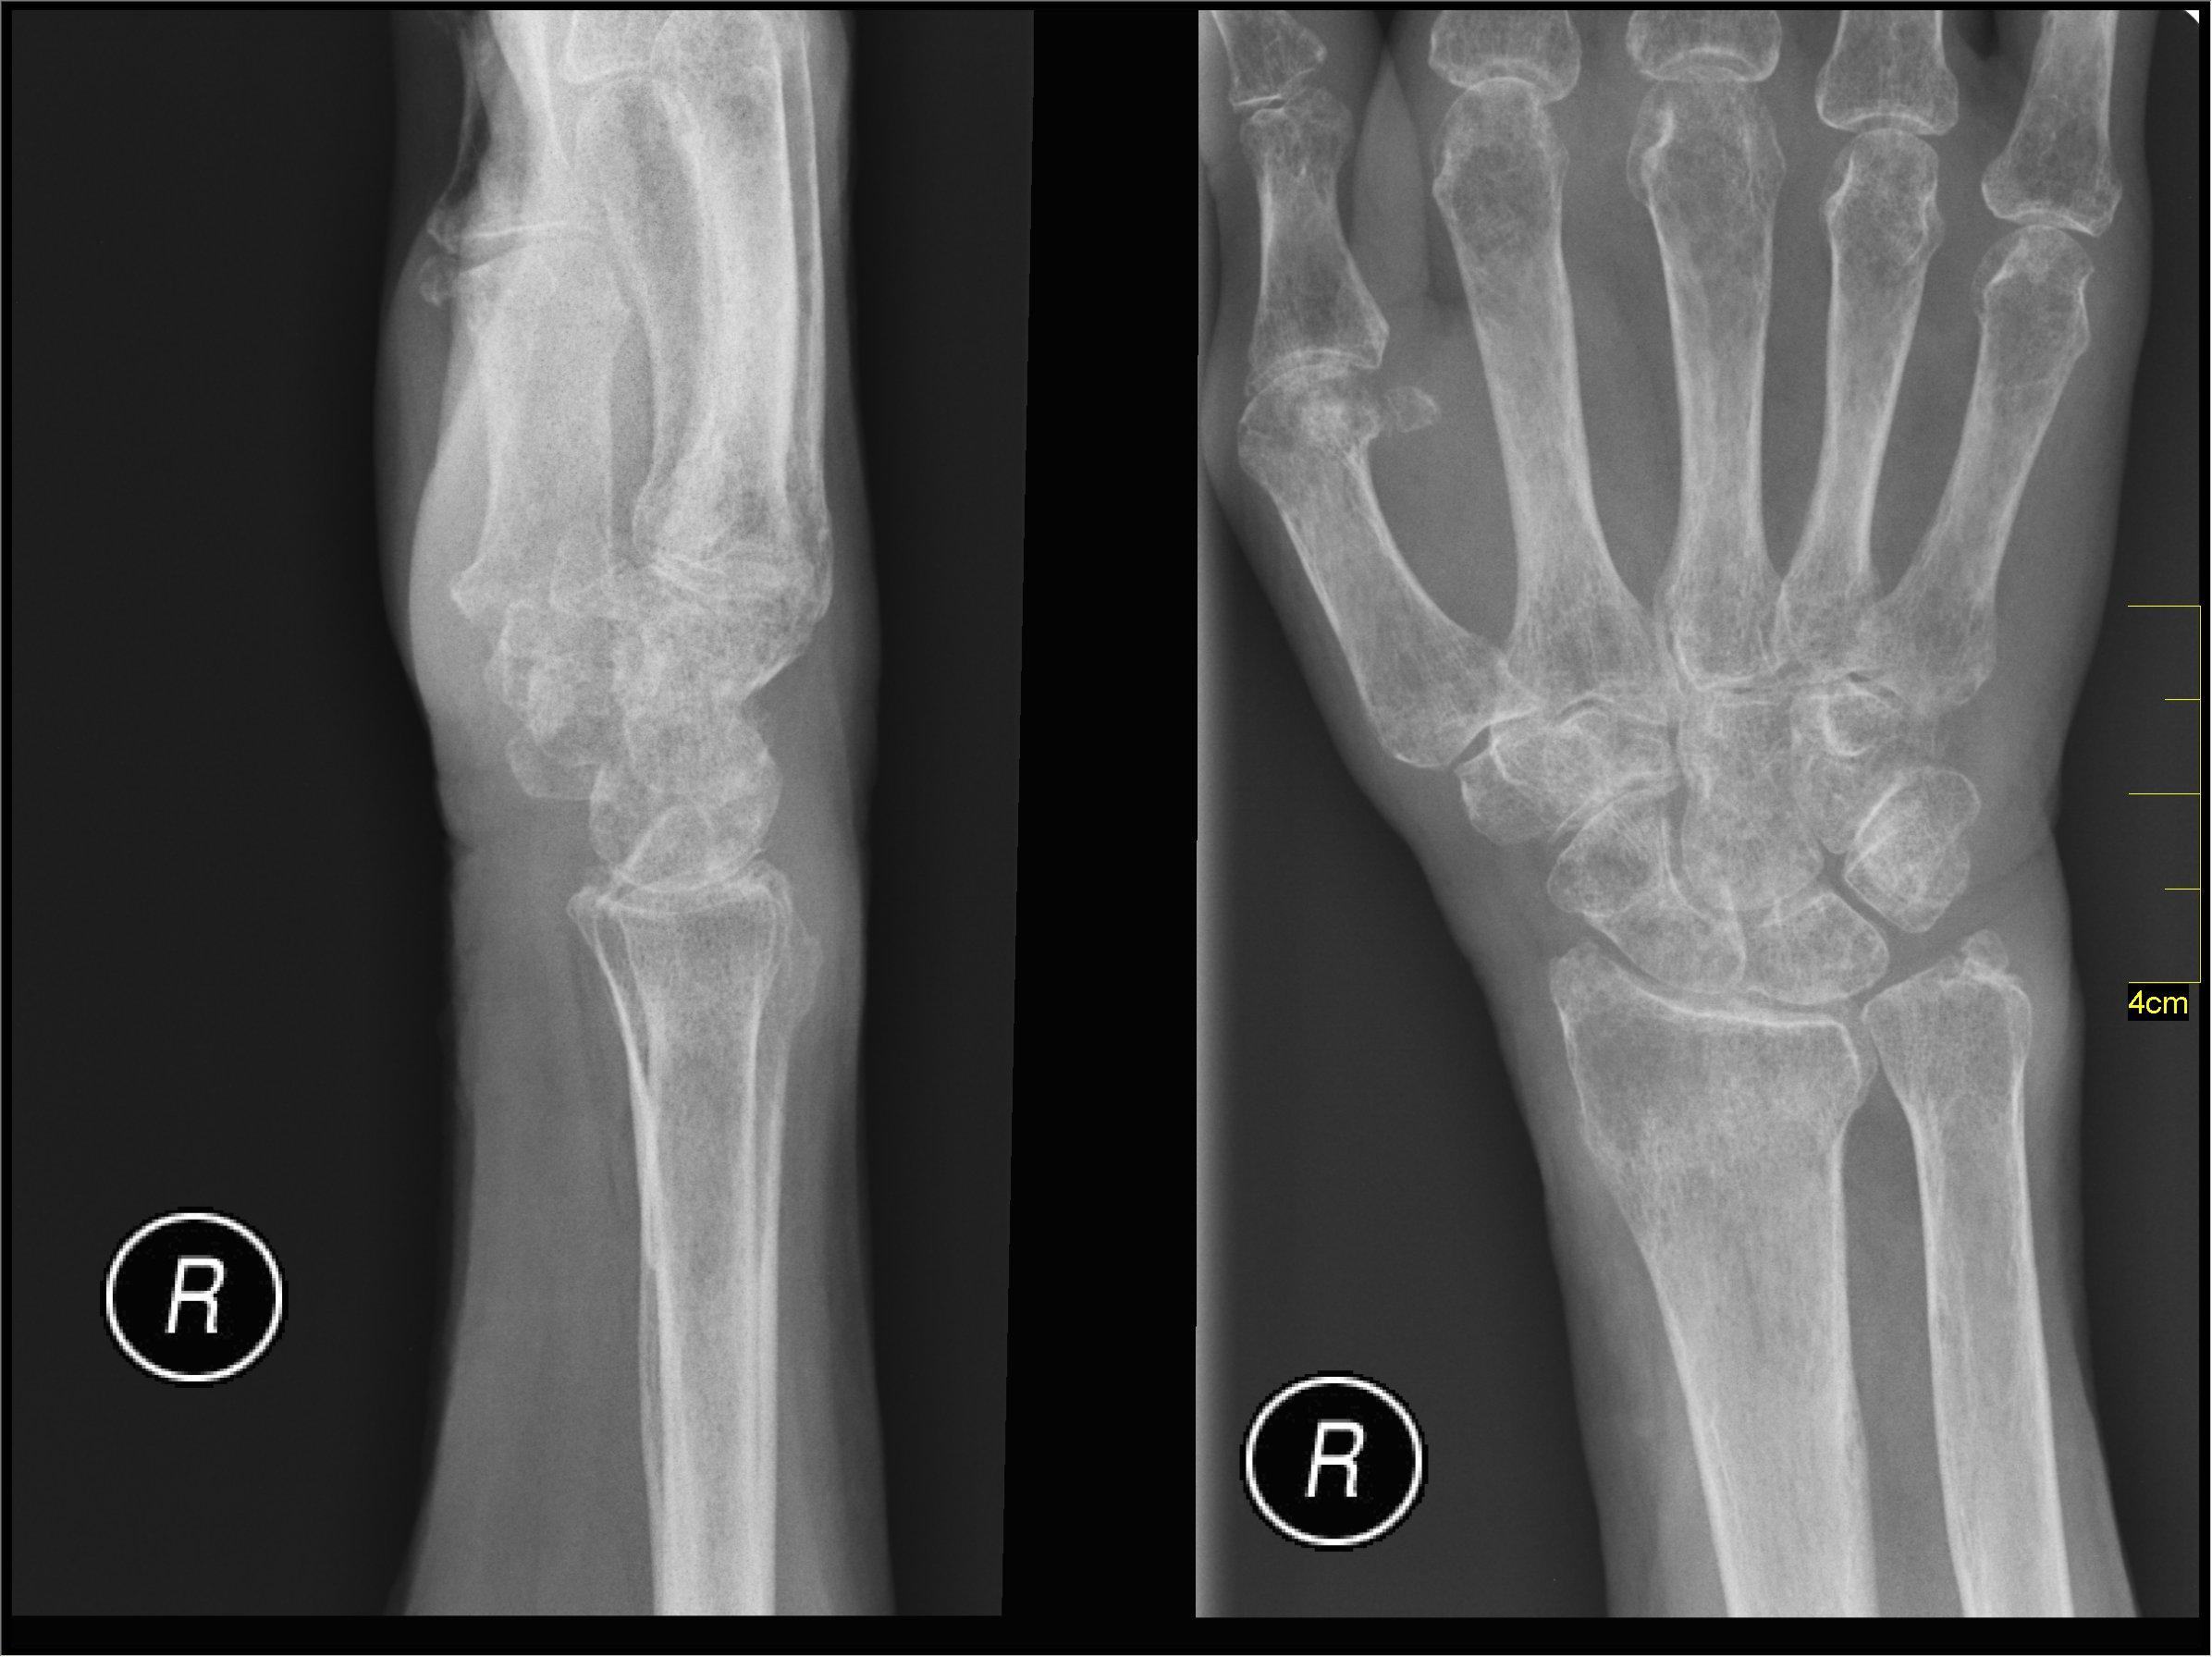 osteoporosis essay osteoporosis essay